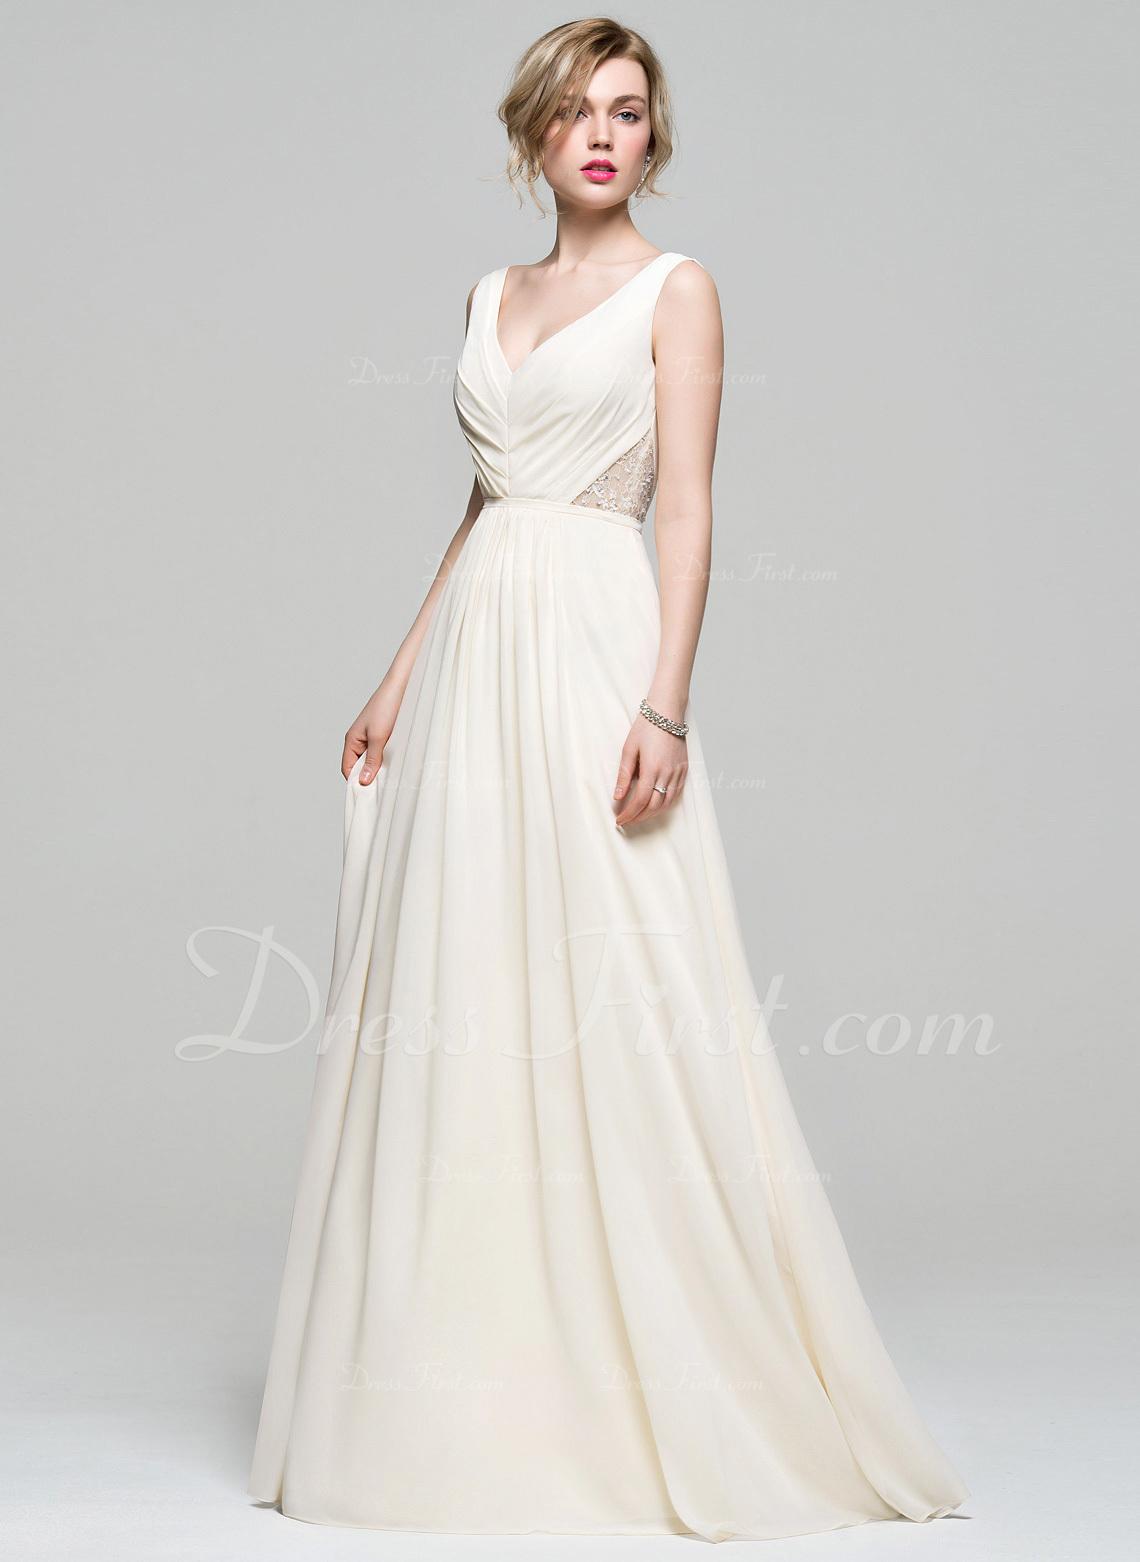 fe89126adfe A-Line Princess V-neck Floor-Length Chiffon Bridesmaid Dress With Ruffle  Lace Beading Sequins  74167